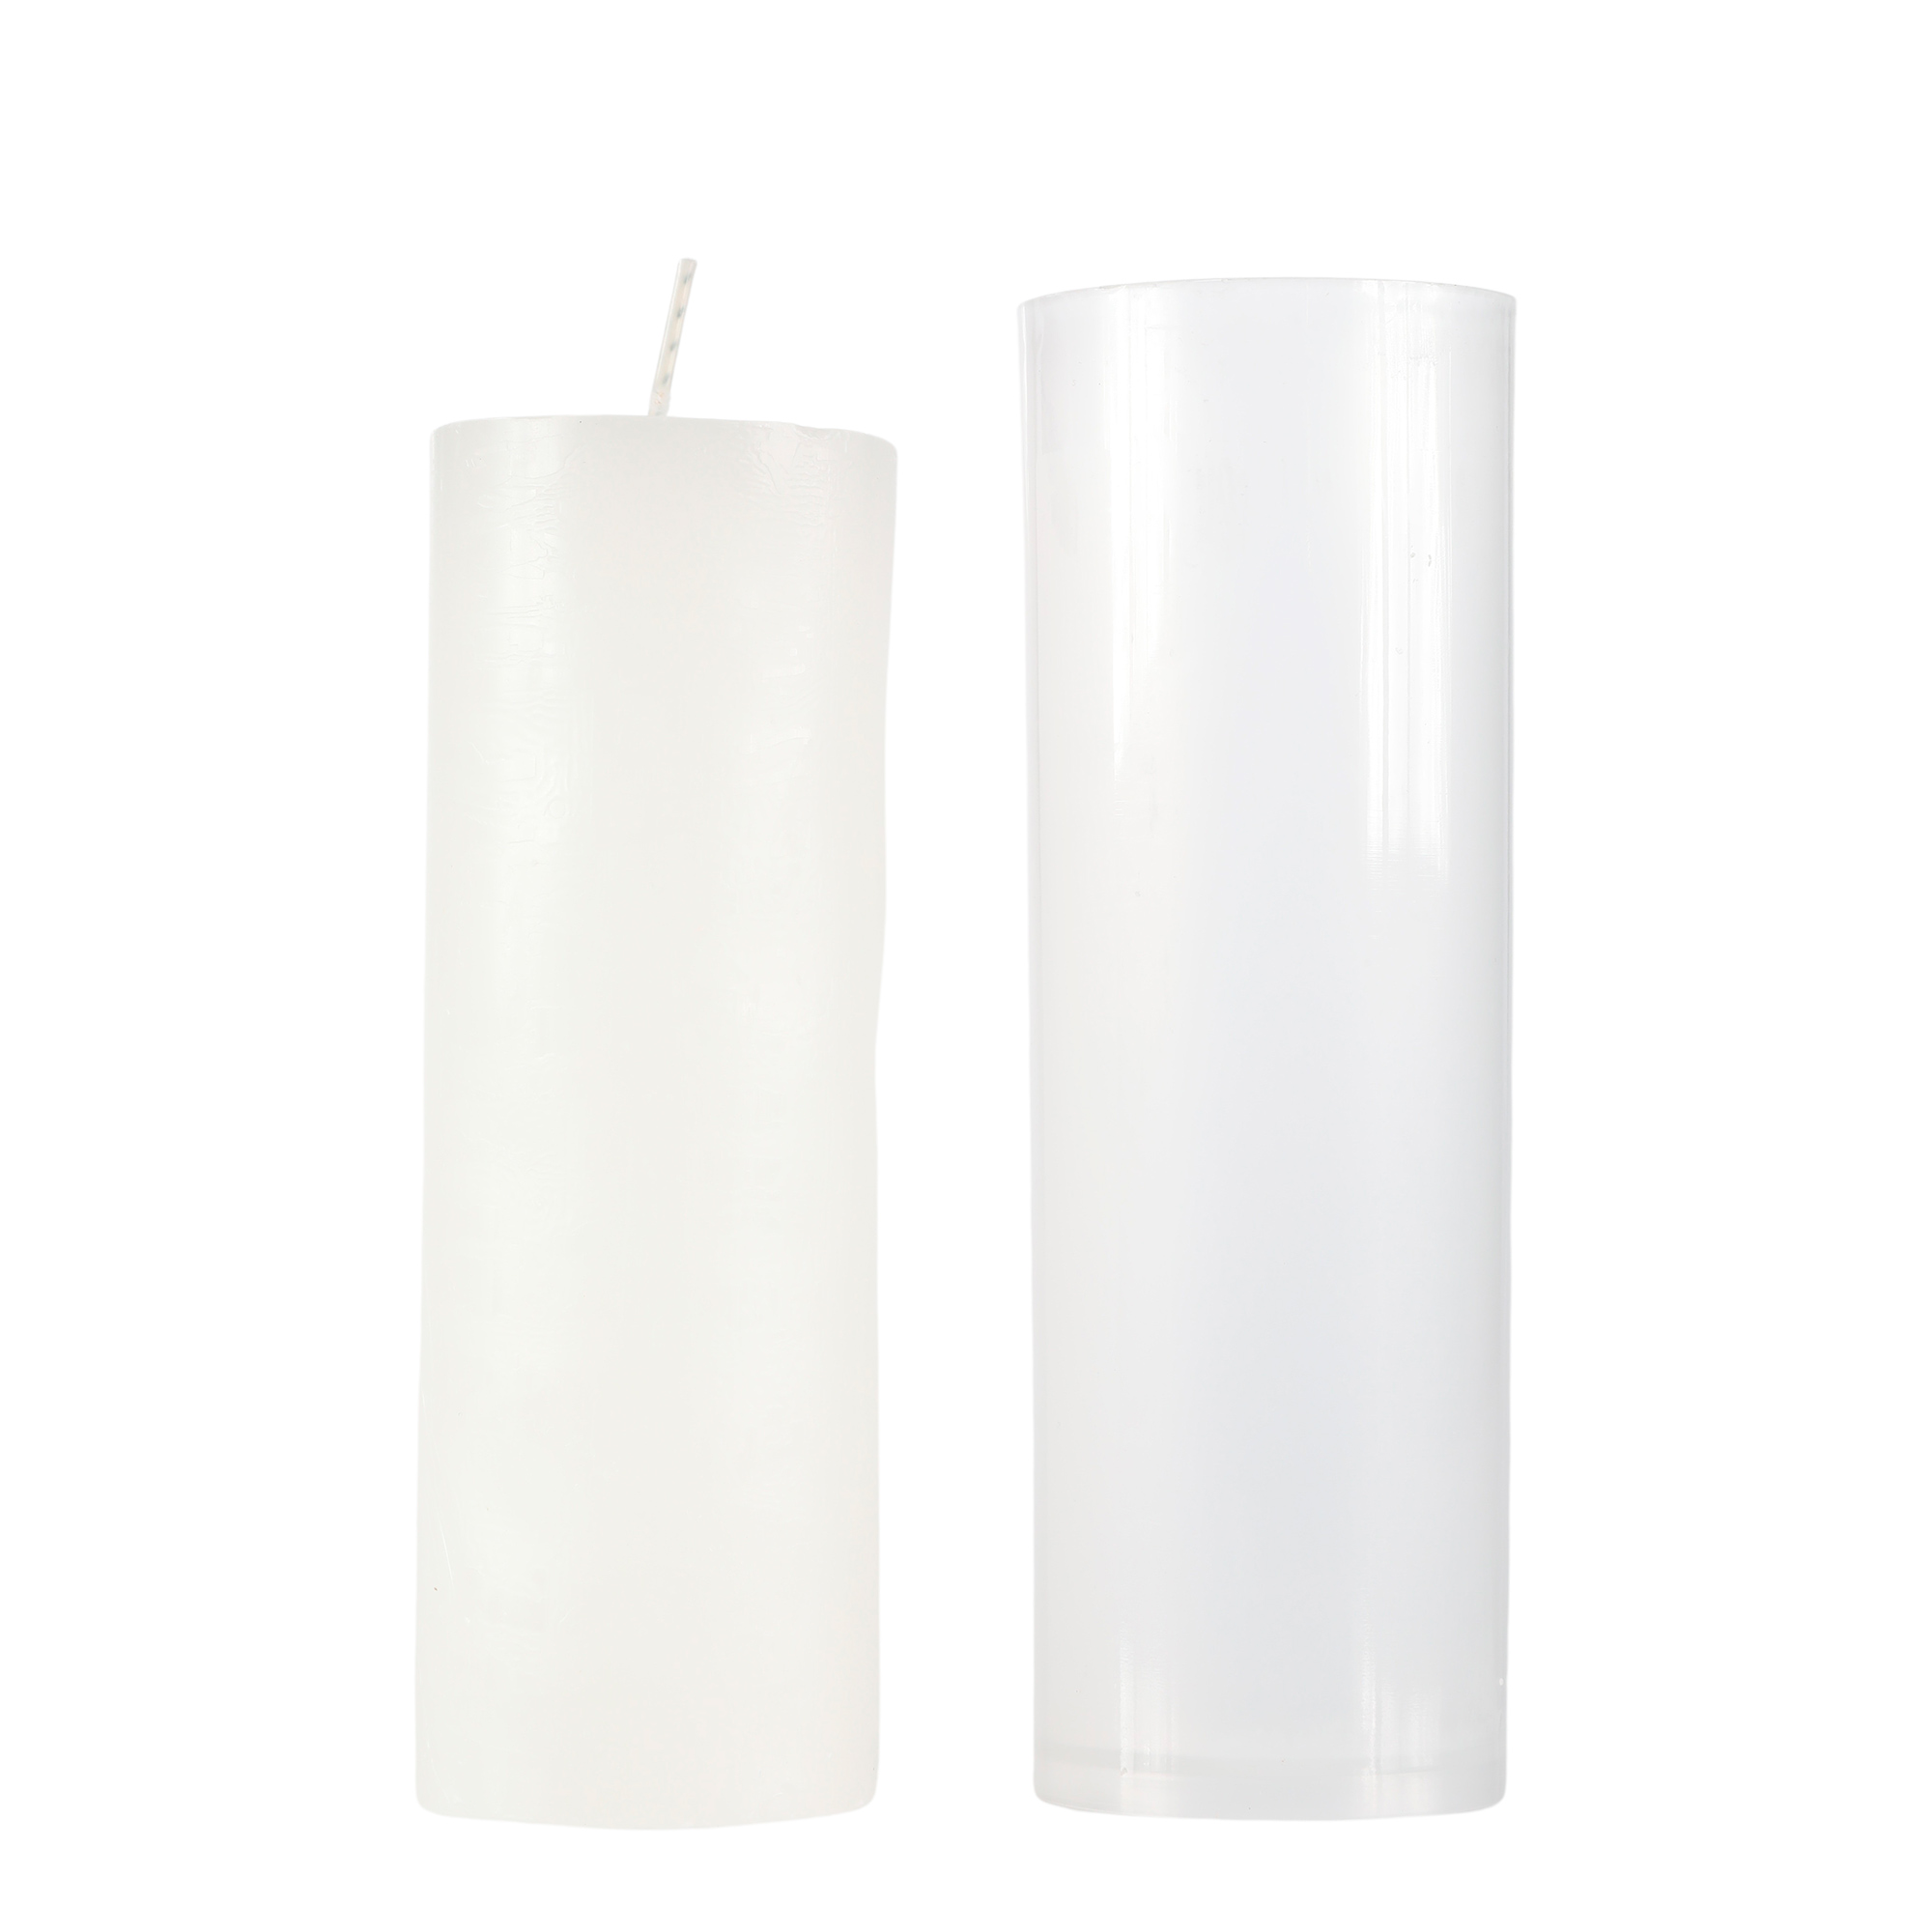 24 velas brancas - 7 dias (250g)